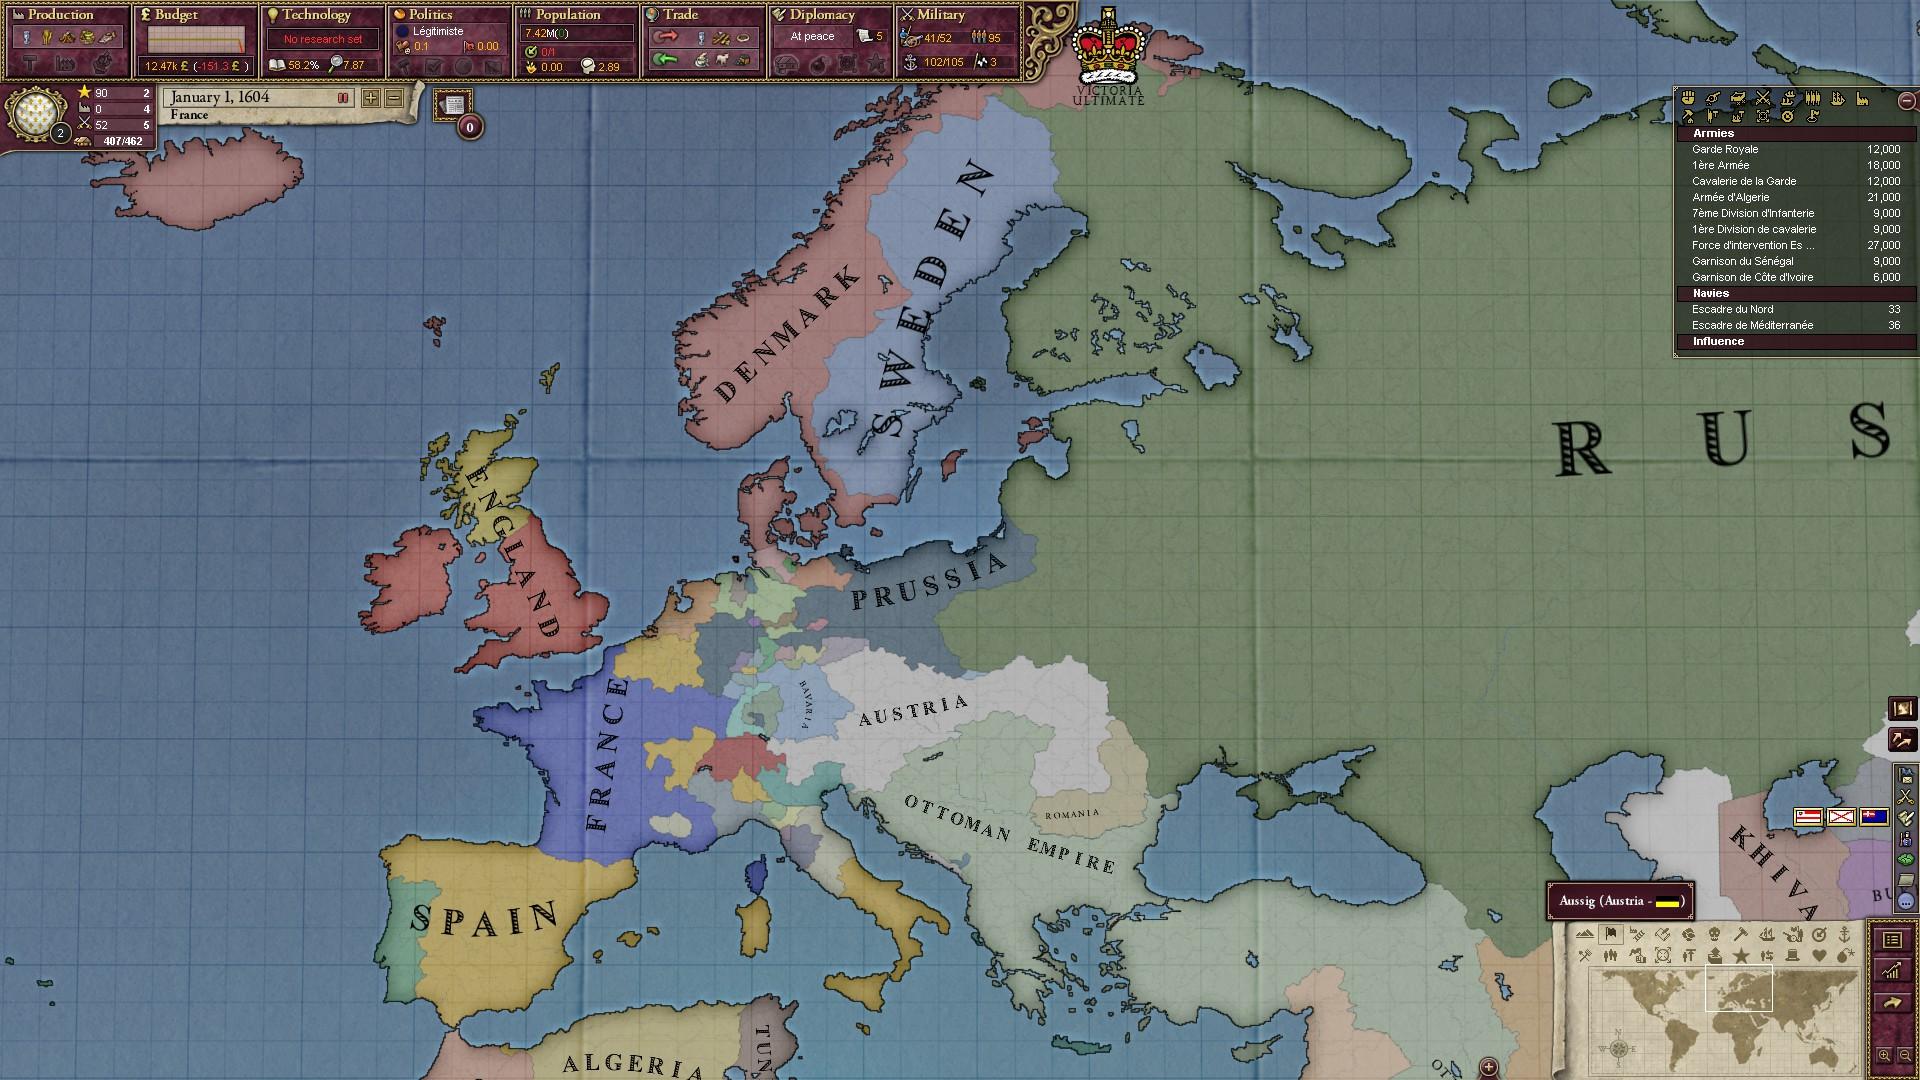 europe 1604 work in progress image